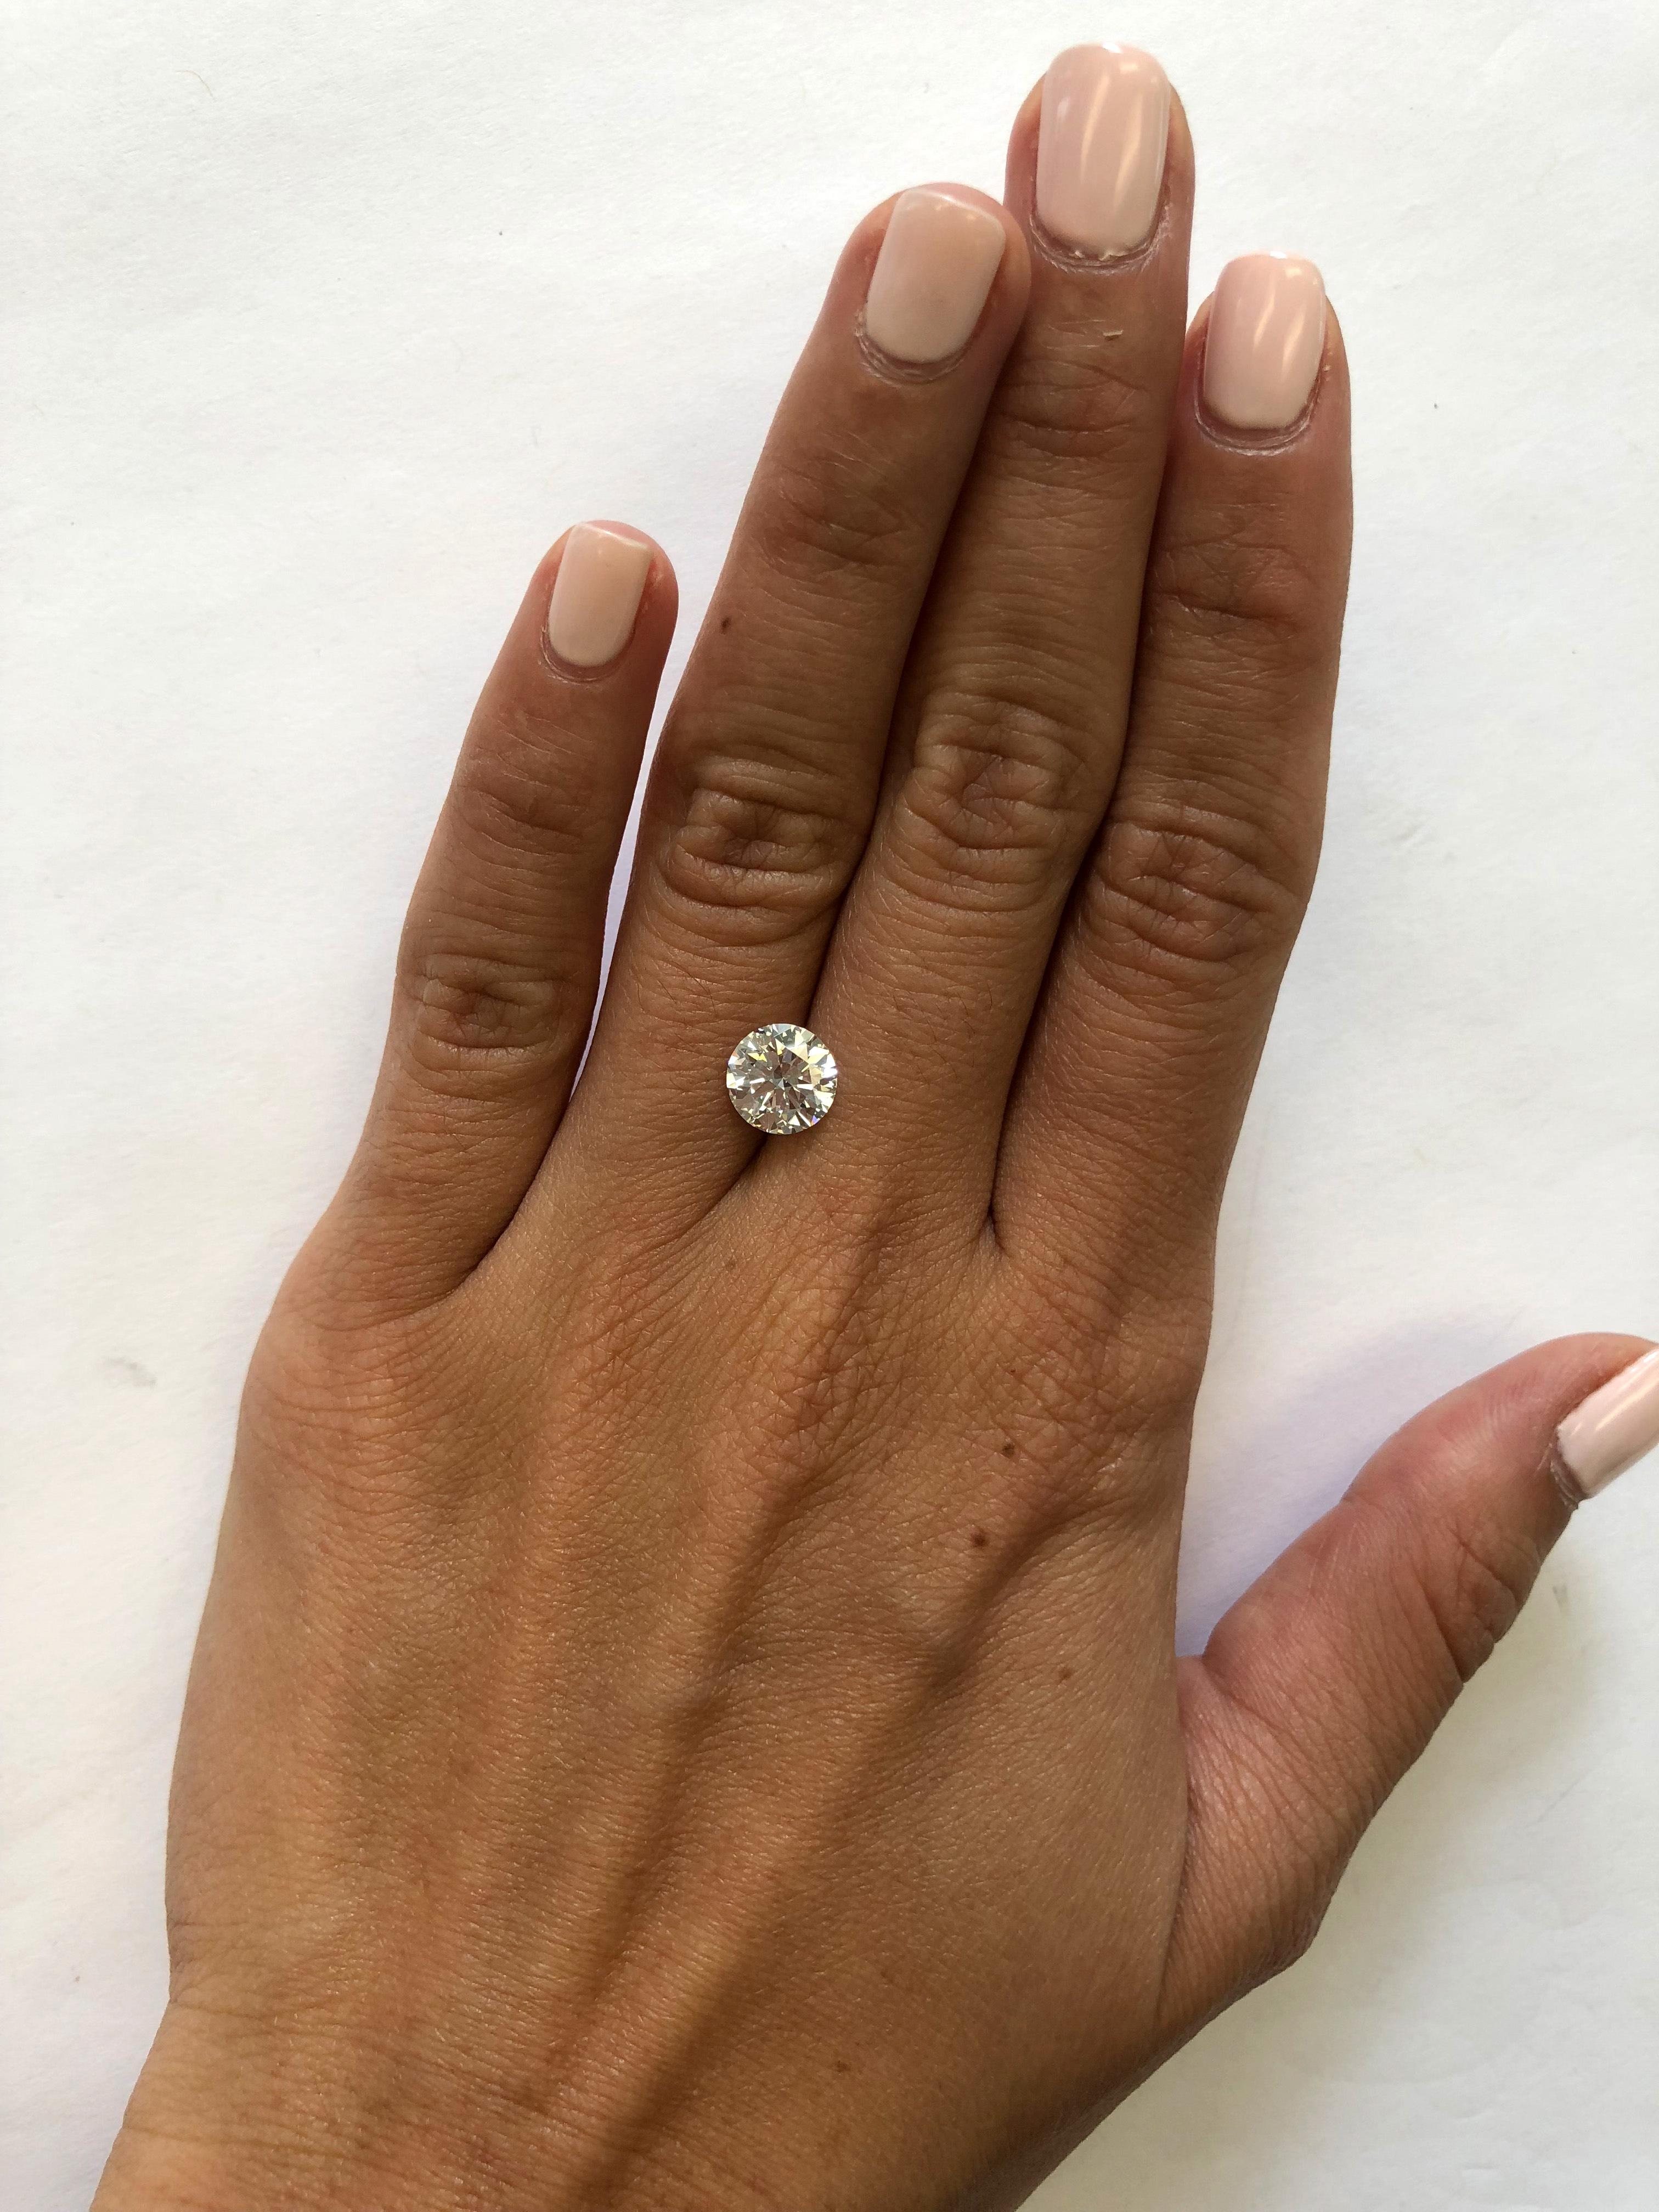 hand with 1.5 carat diamond